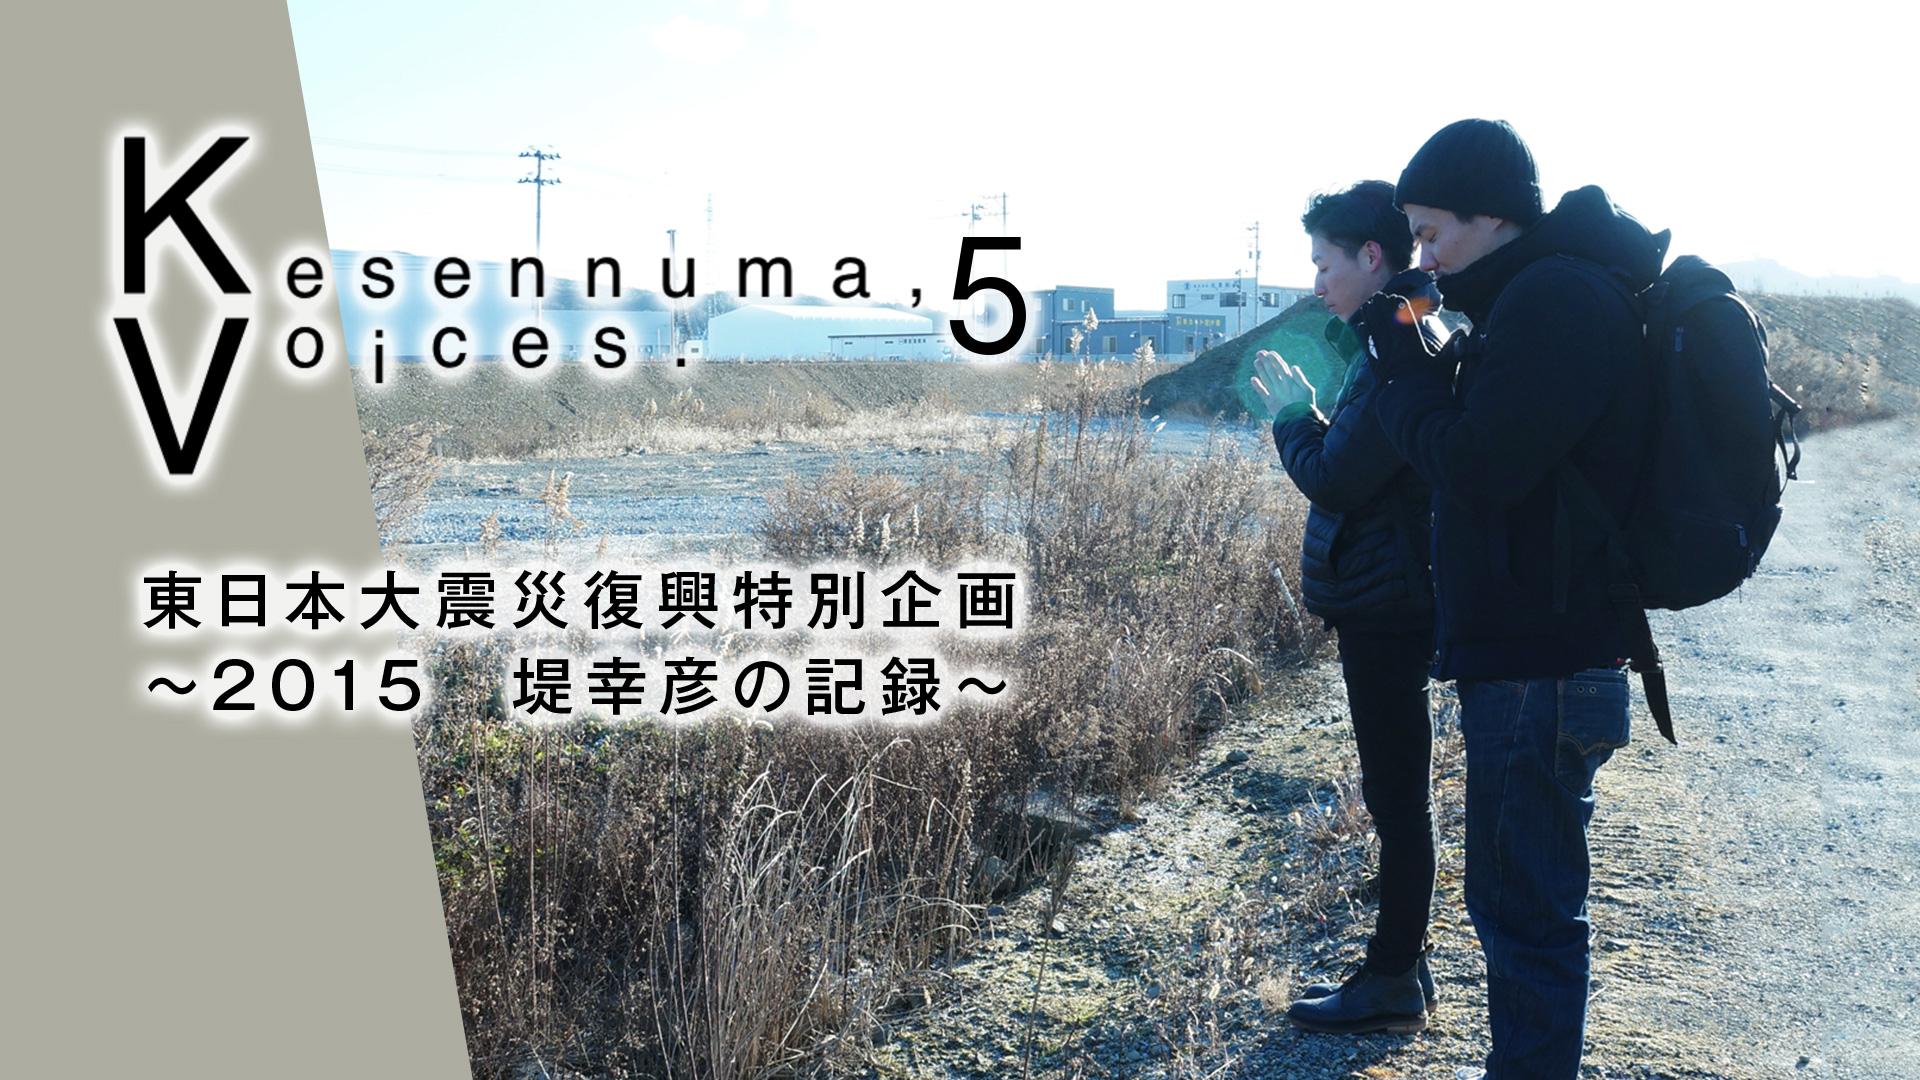 Kesennuma,Voices.5 東日本大震災復興特別企画~2015 堤幸彦の記録~の動画 - Kesennuma,Voices.7 東日本大震災復興特別企画~2017 堤幸彦の記録~